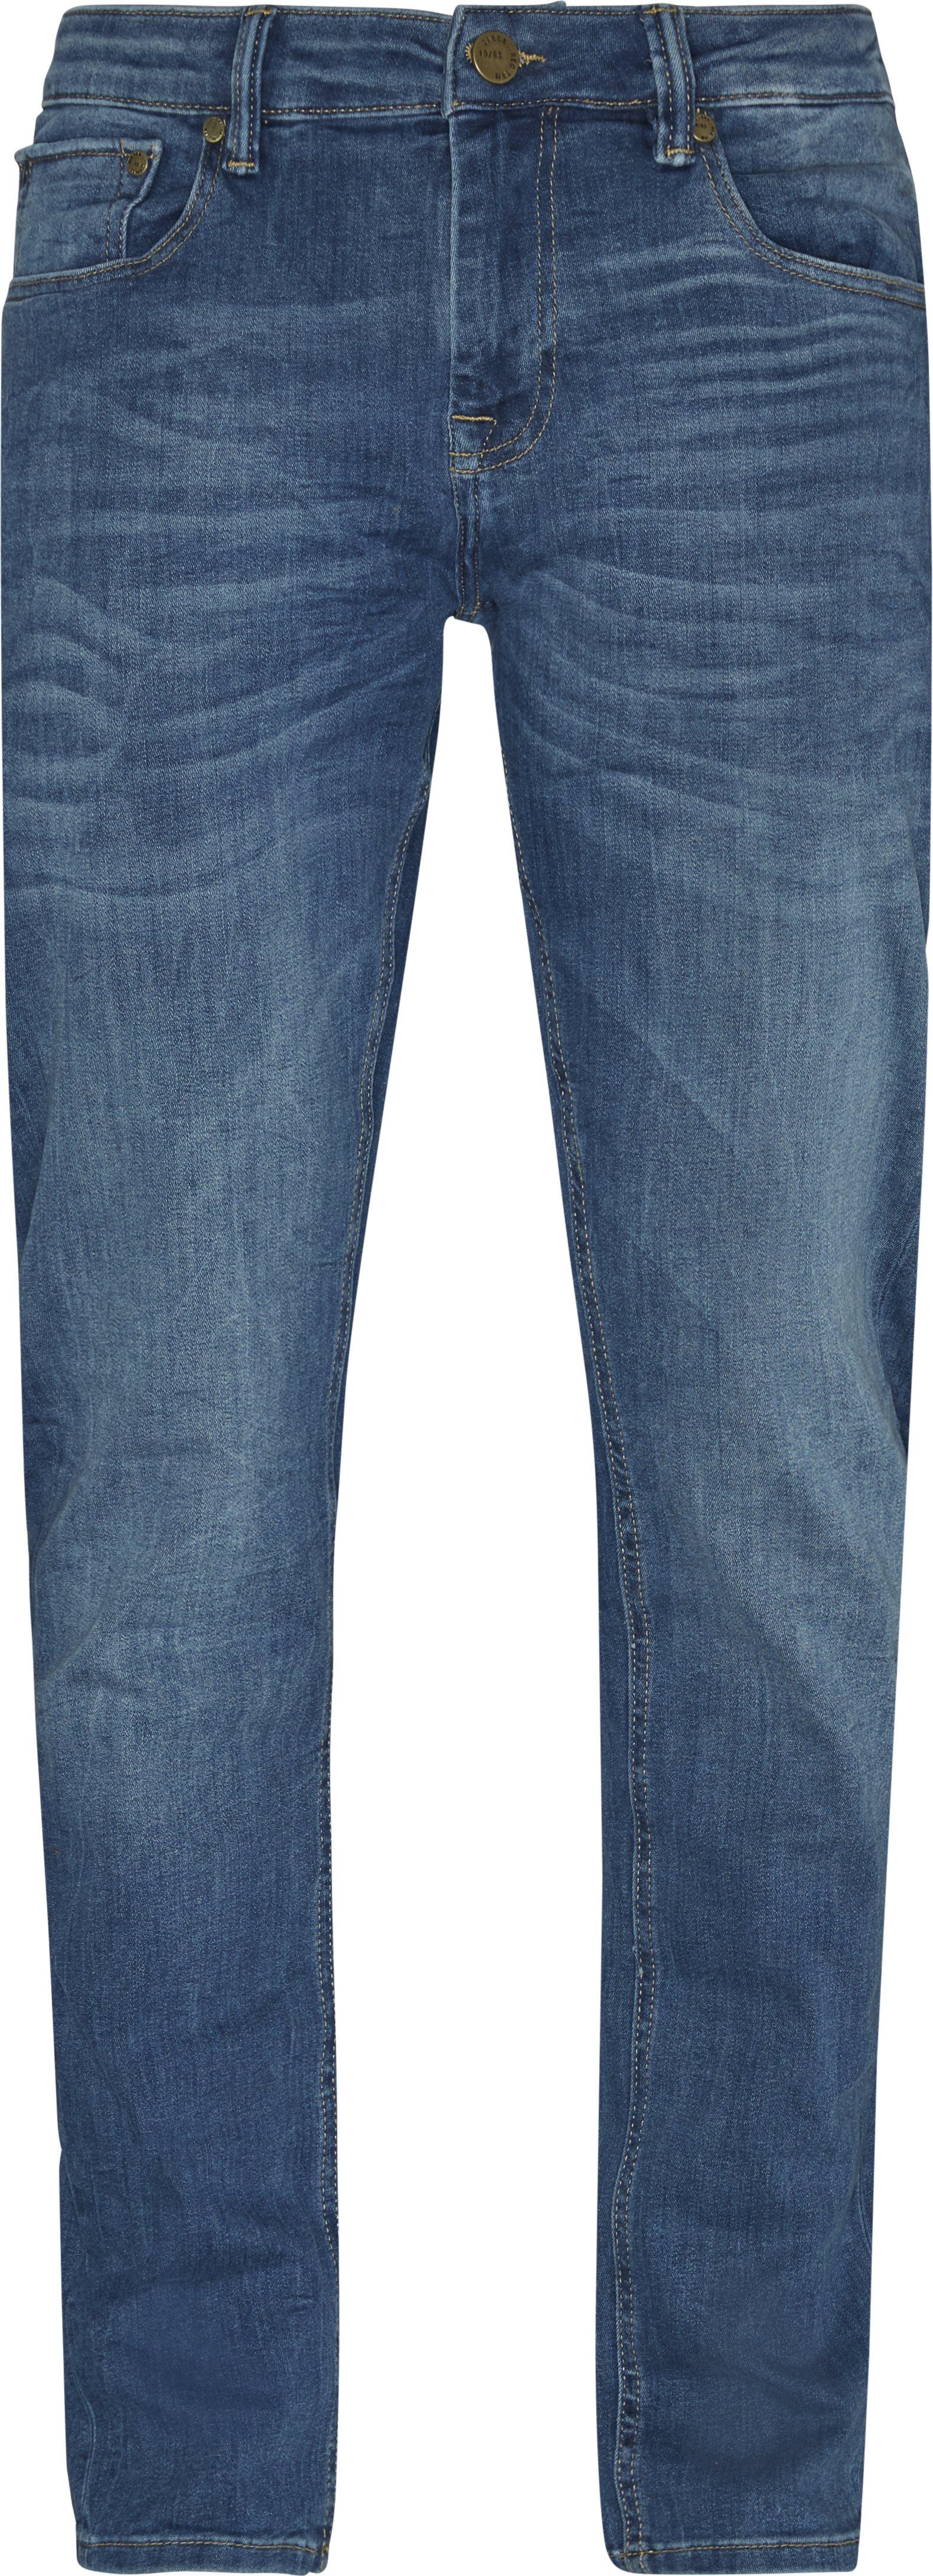 Jones Jeans - Jeans - Tapered fit - Denim